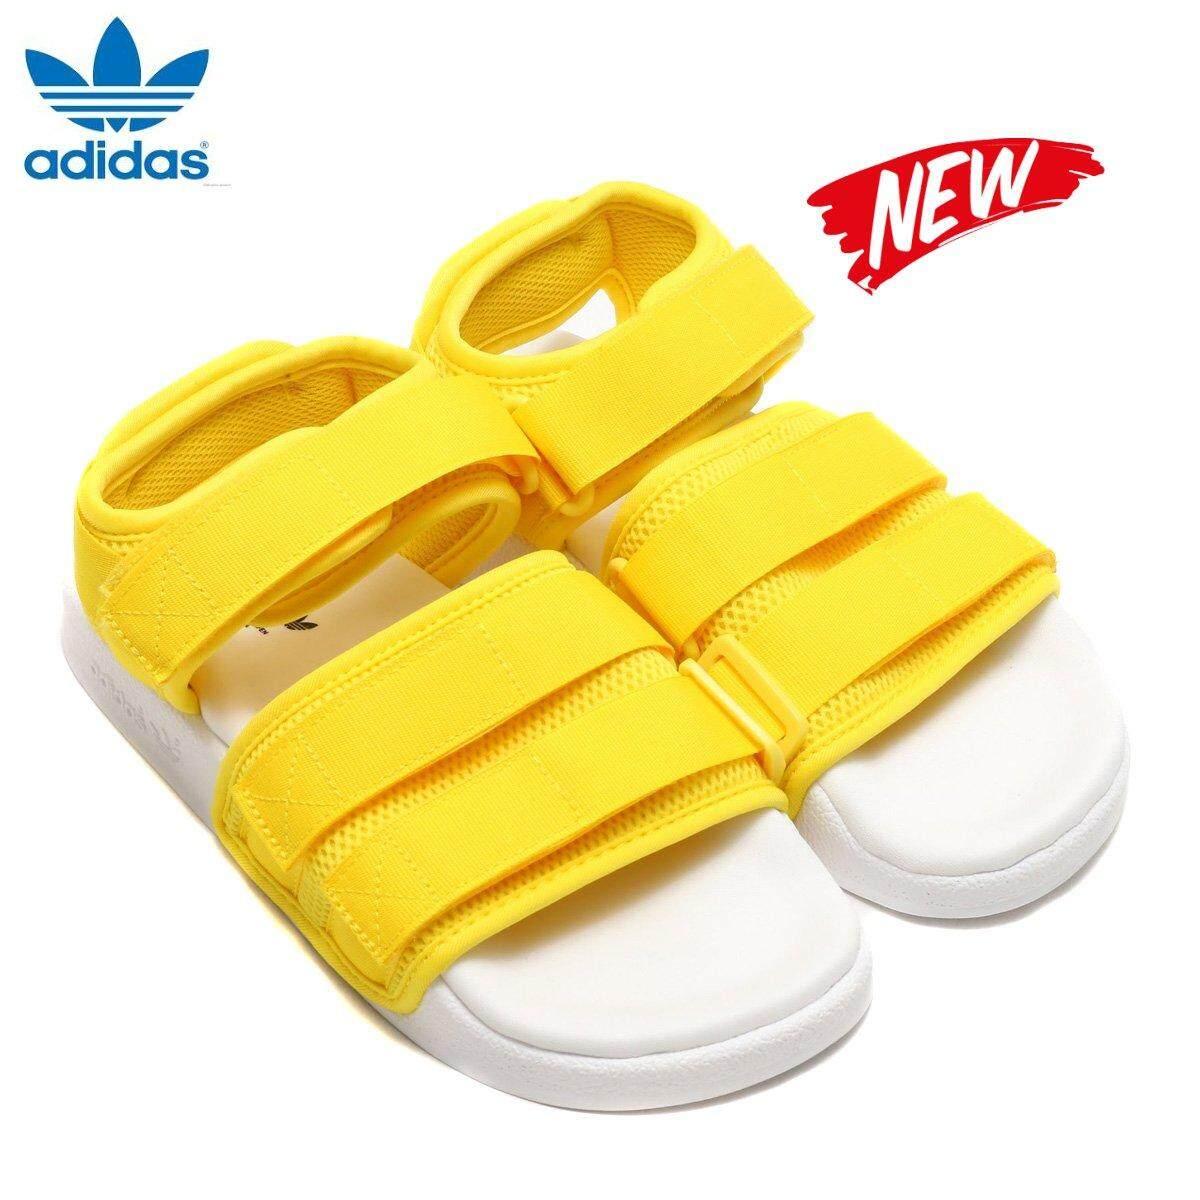 5336cca8ce64 Adidas Original New Unisex Adilette Sandal CQ2673 Yellow White 100% Original